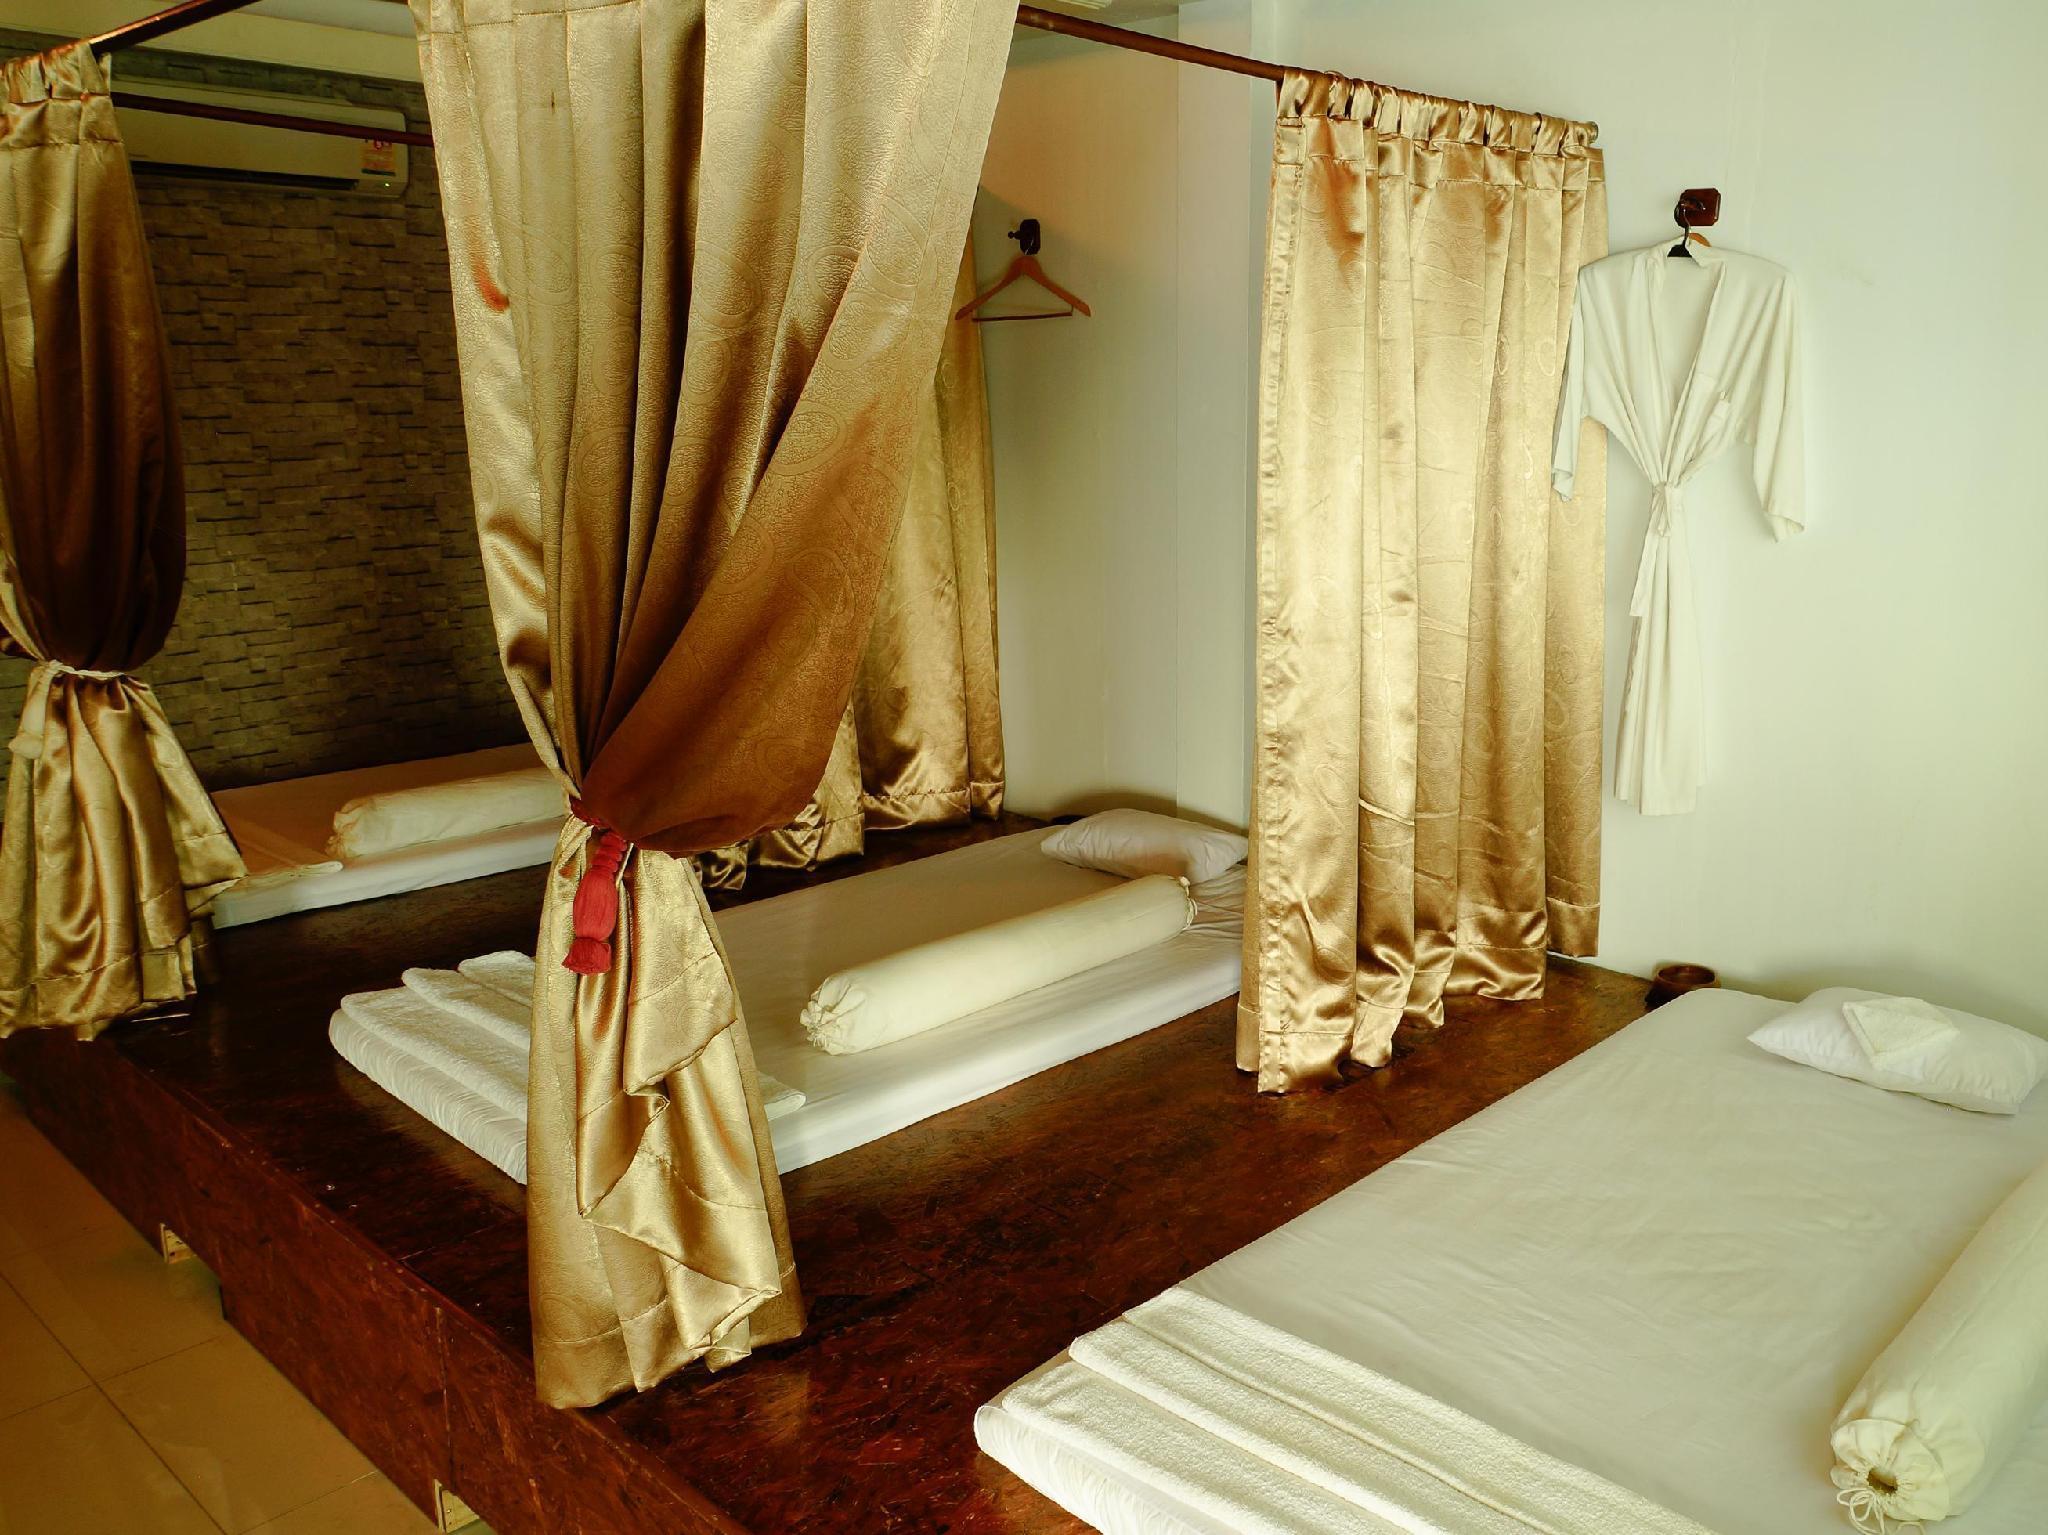 Saphan Krungthep Hostel